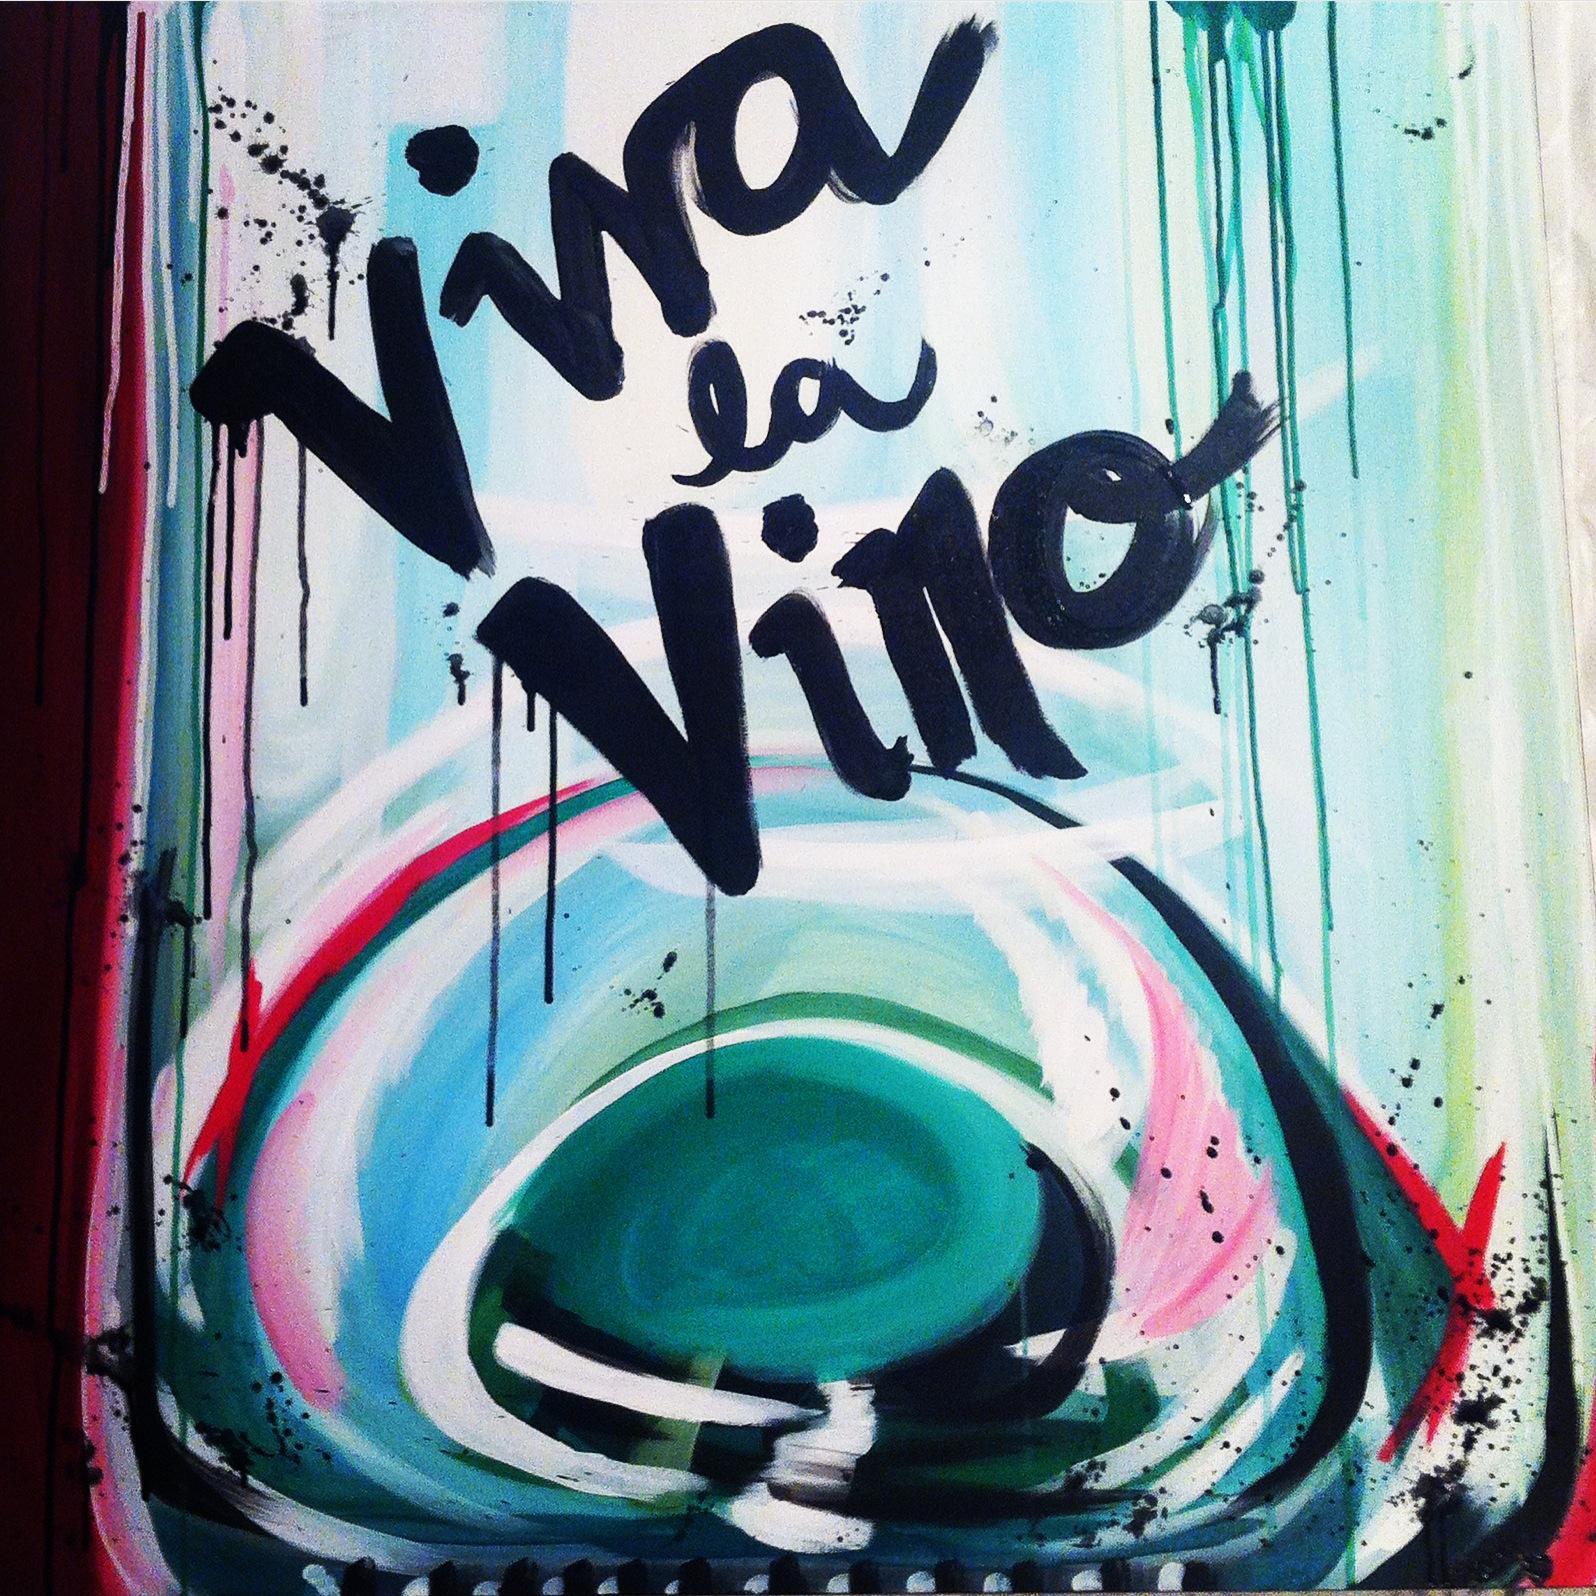 Viva La Vino by Jace Actually